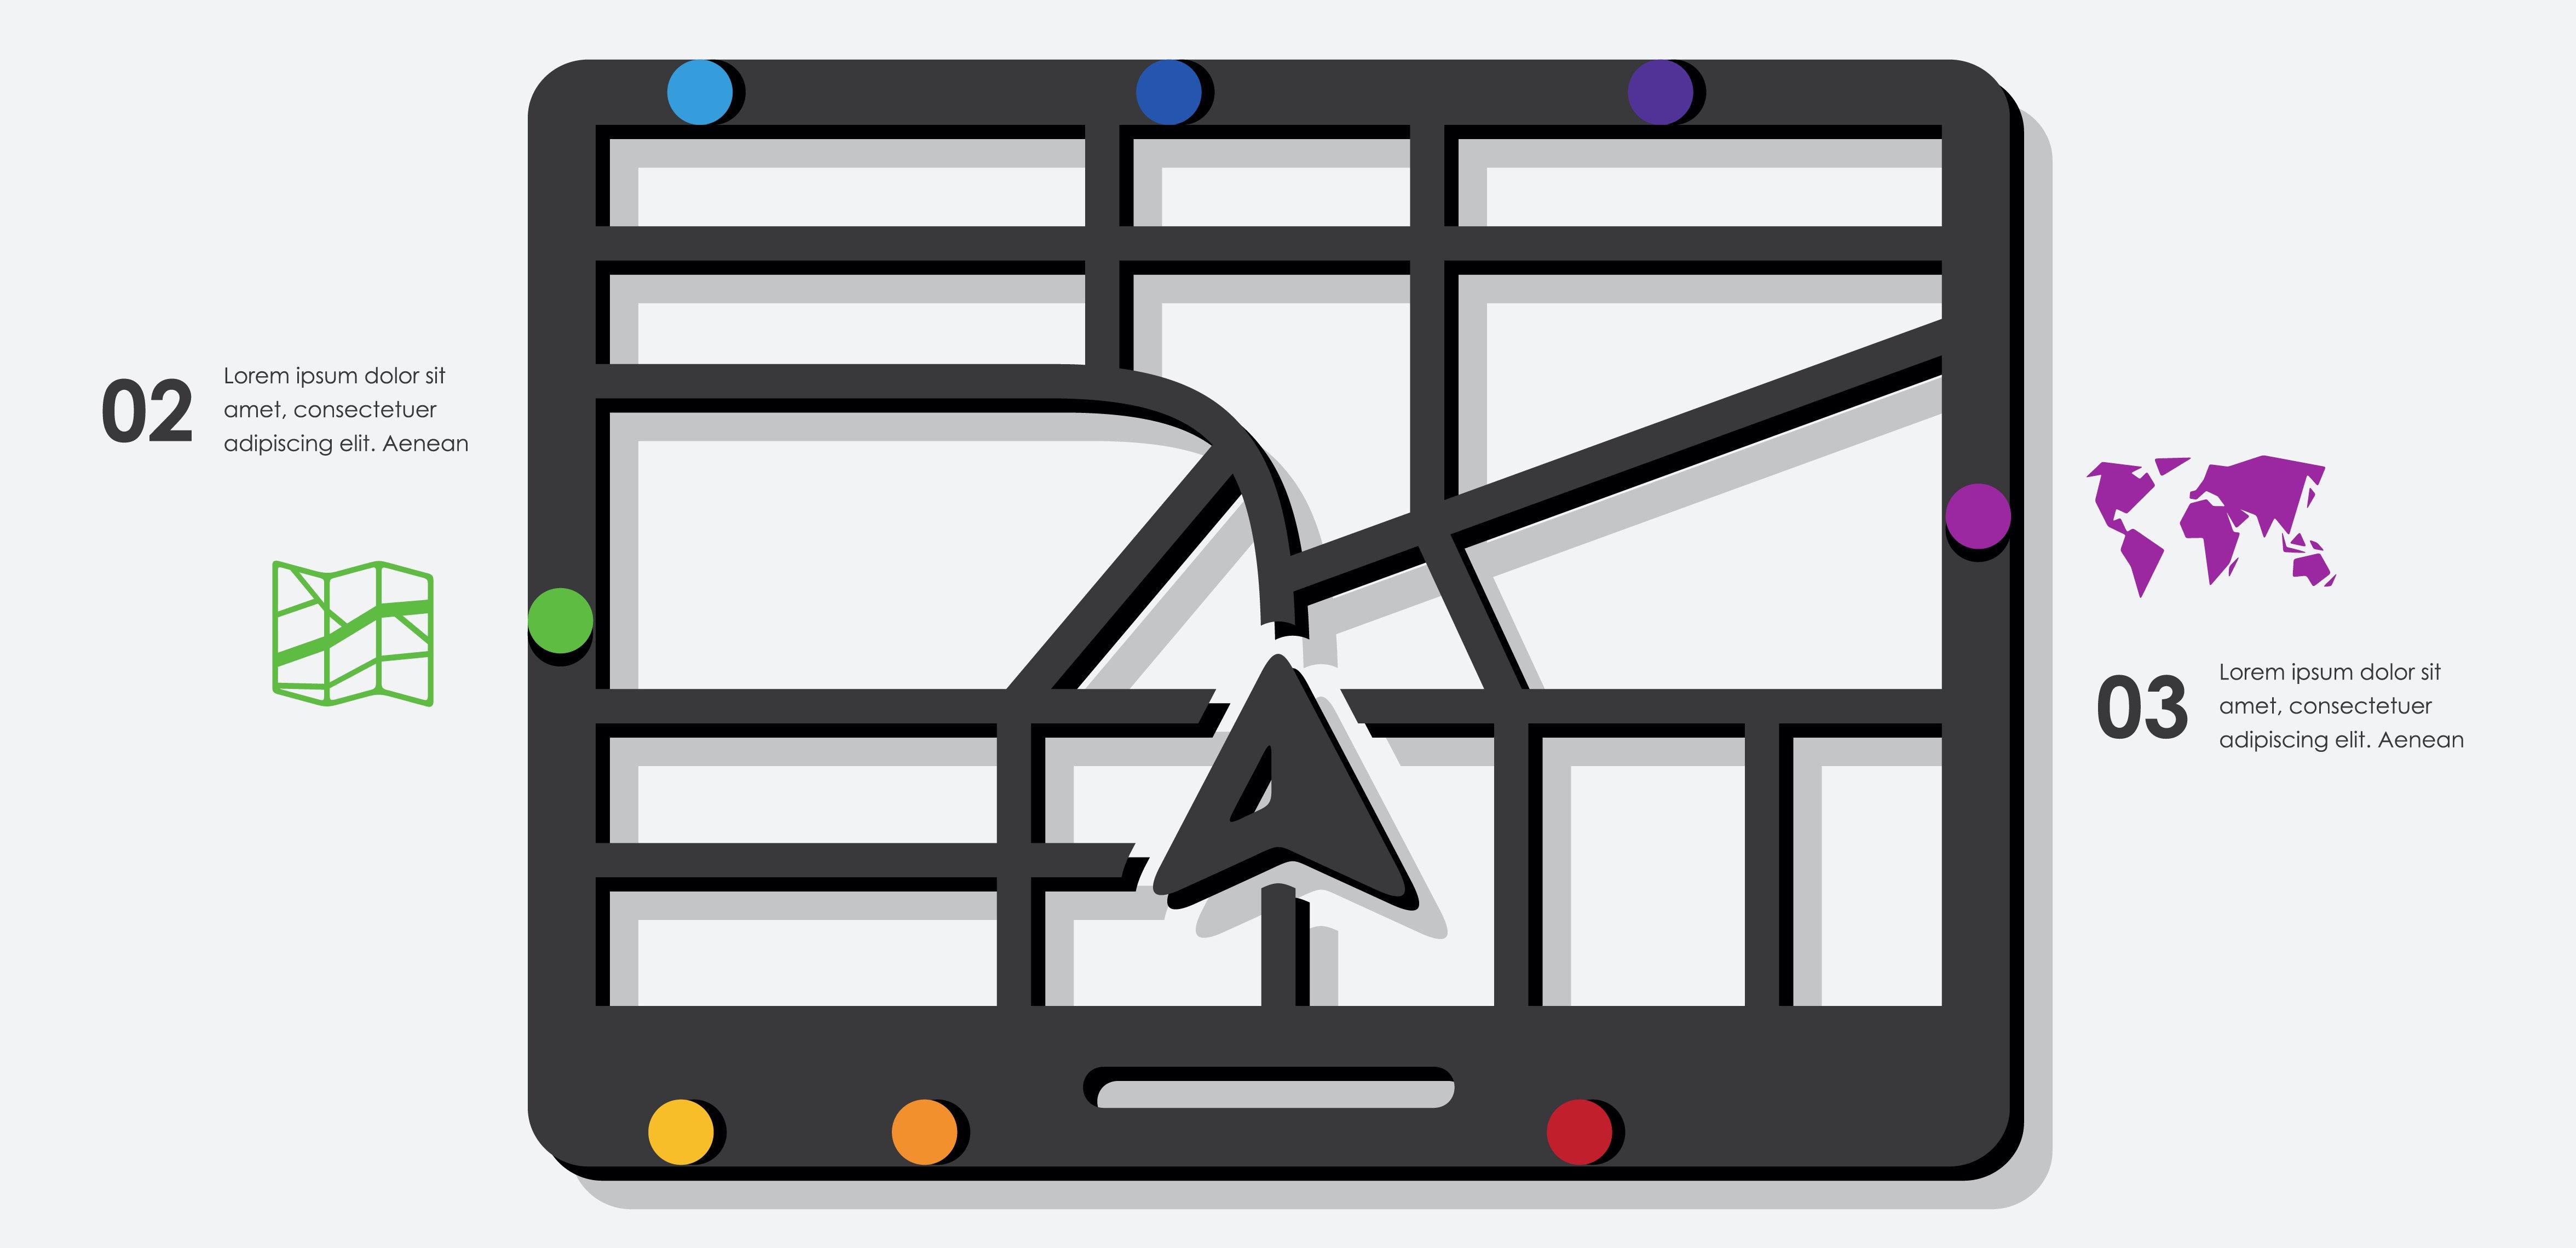 Illustration showing real-time data alerts